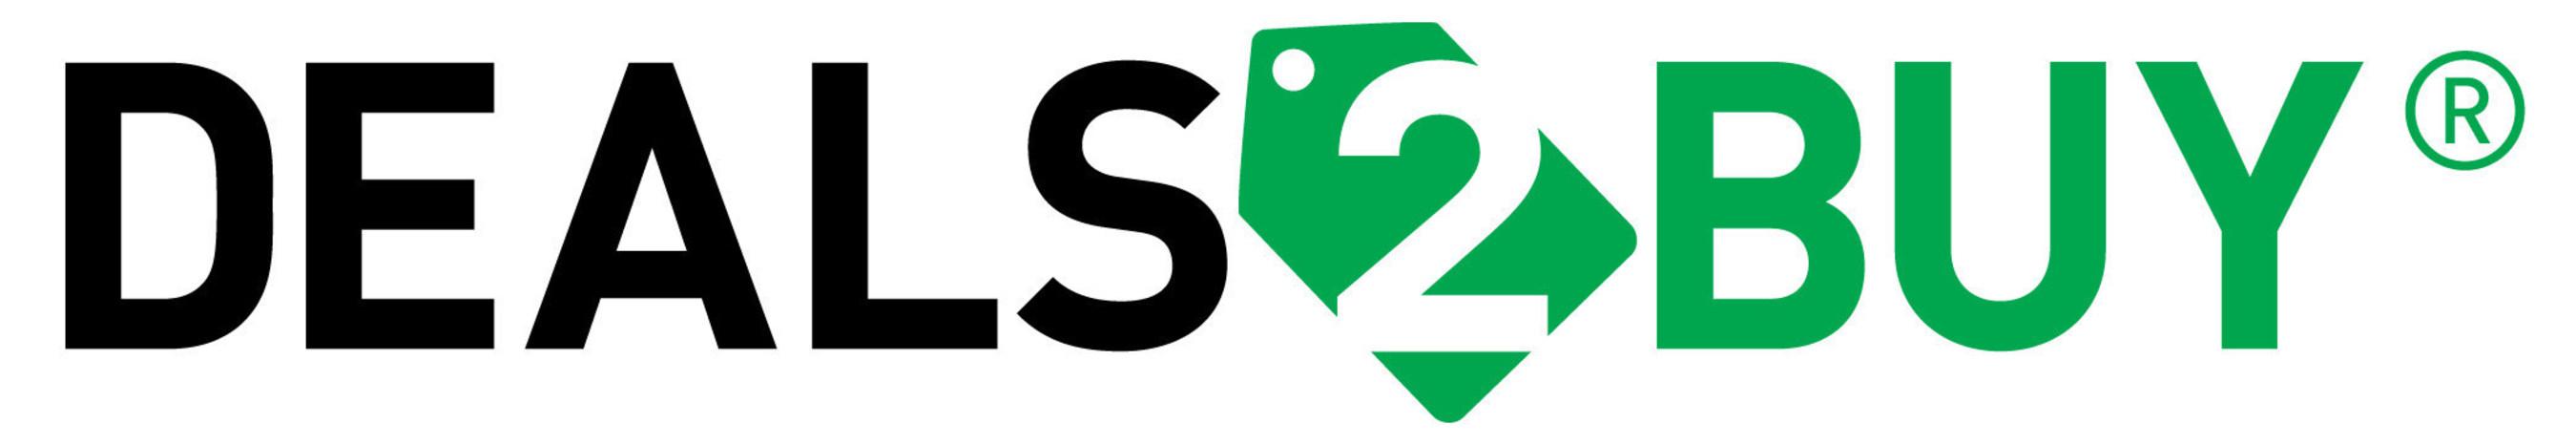 Deals2buy Redesign Includes Streamlined Navigation Responsive Design Sorting And Social Media Sharing